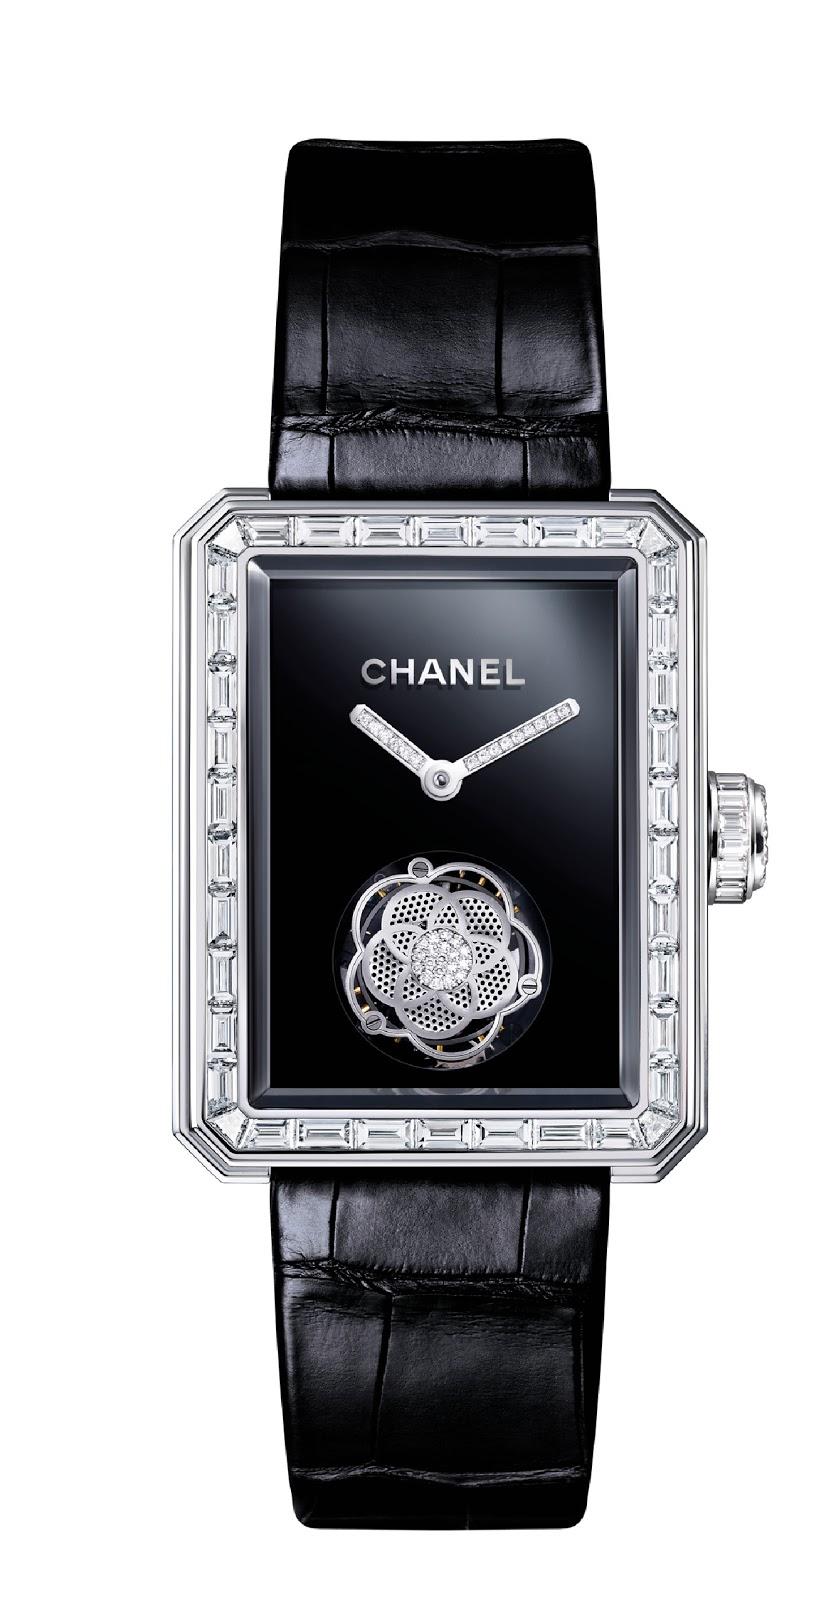 Chanel celebra el 25º aniversario de su primer reloj  8fbb1a12446a